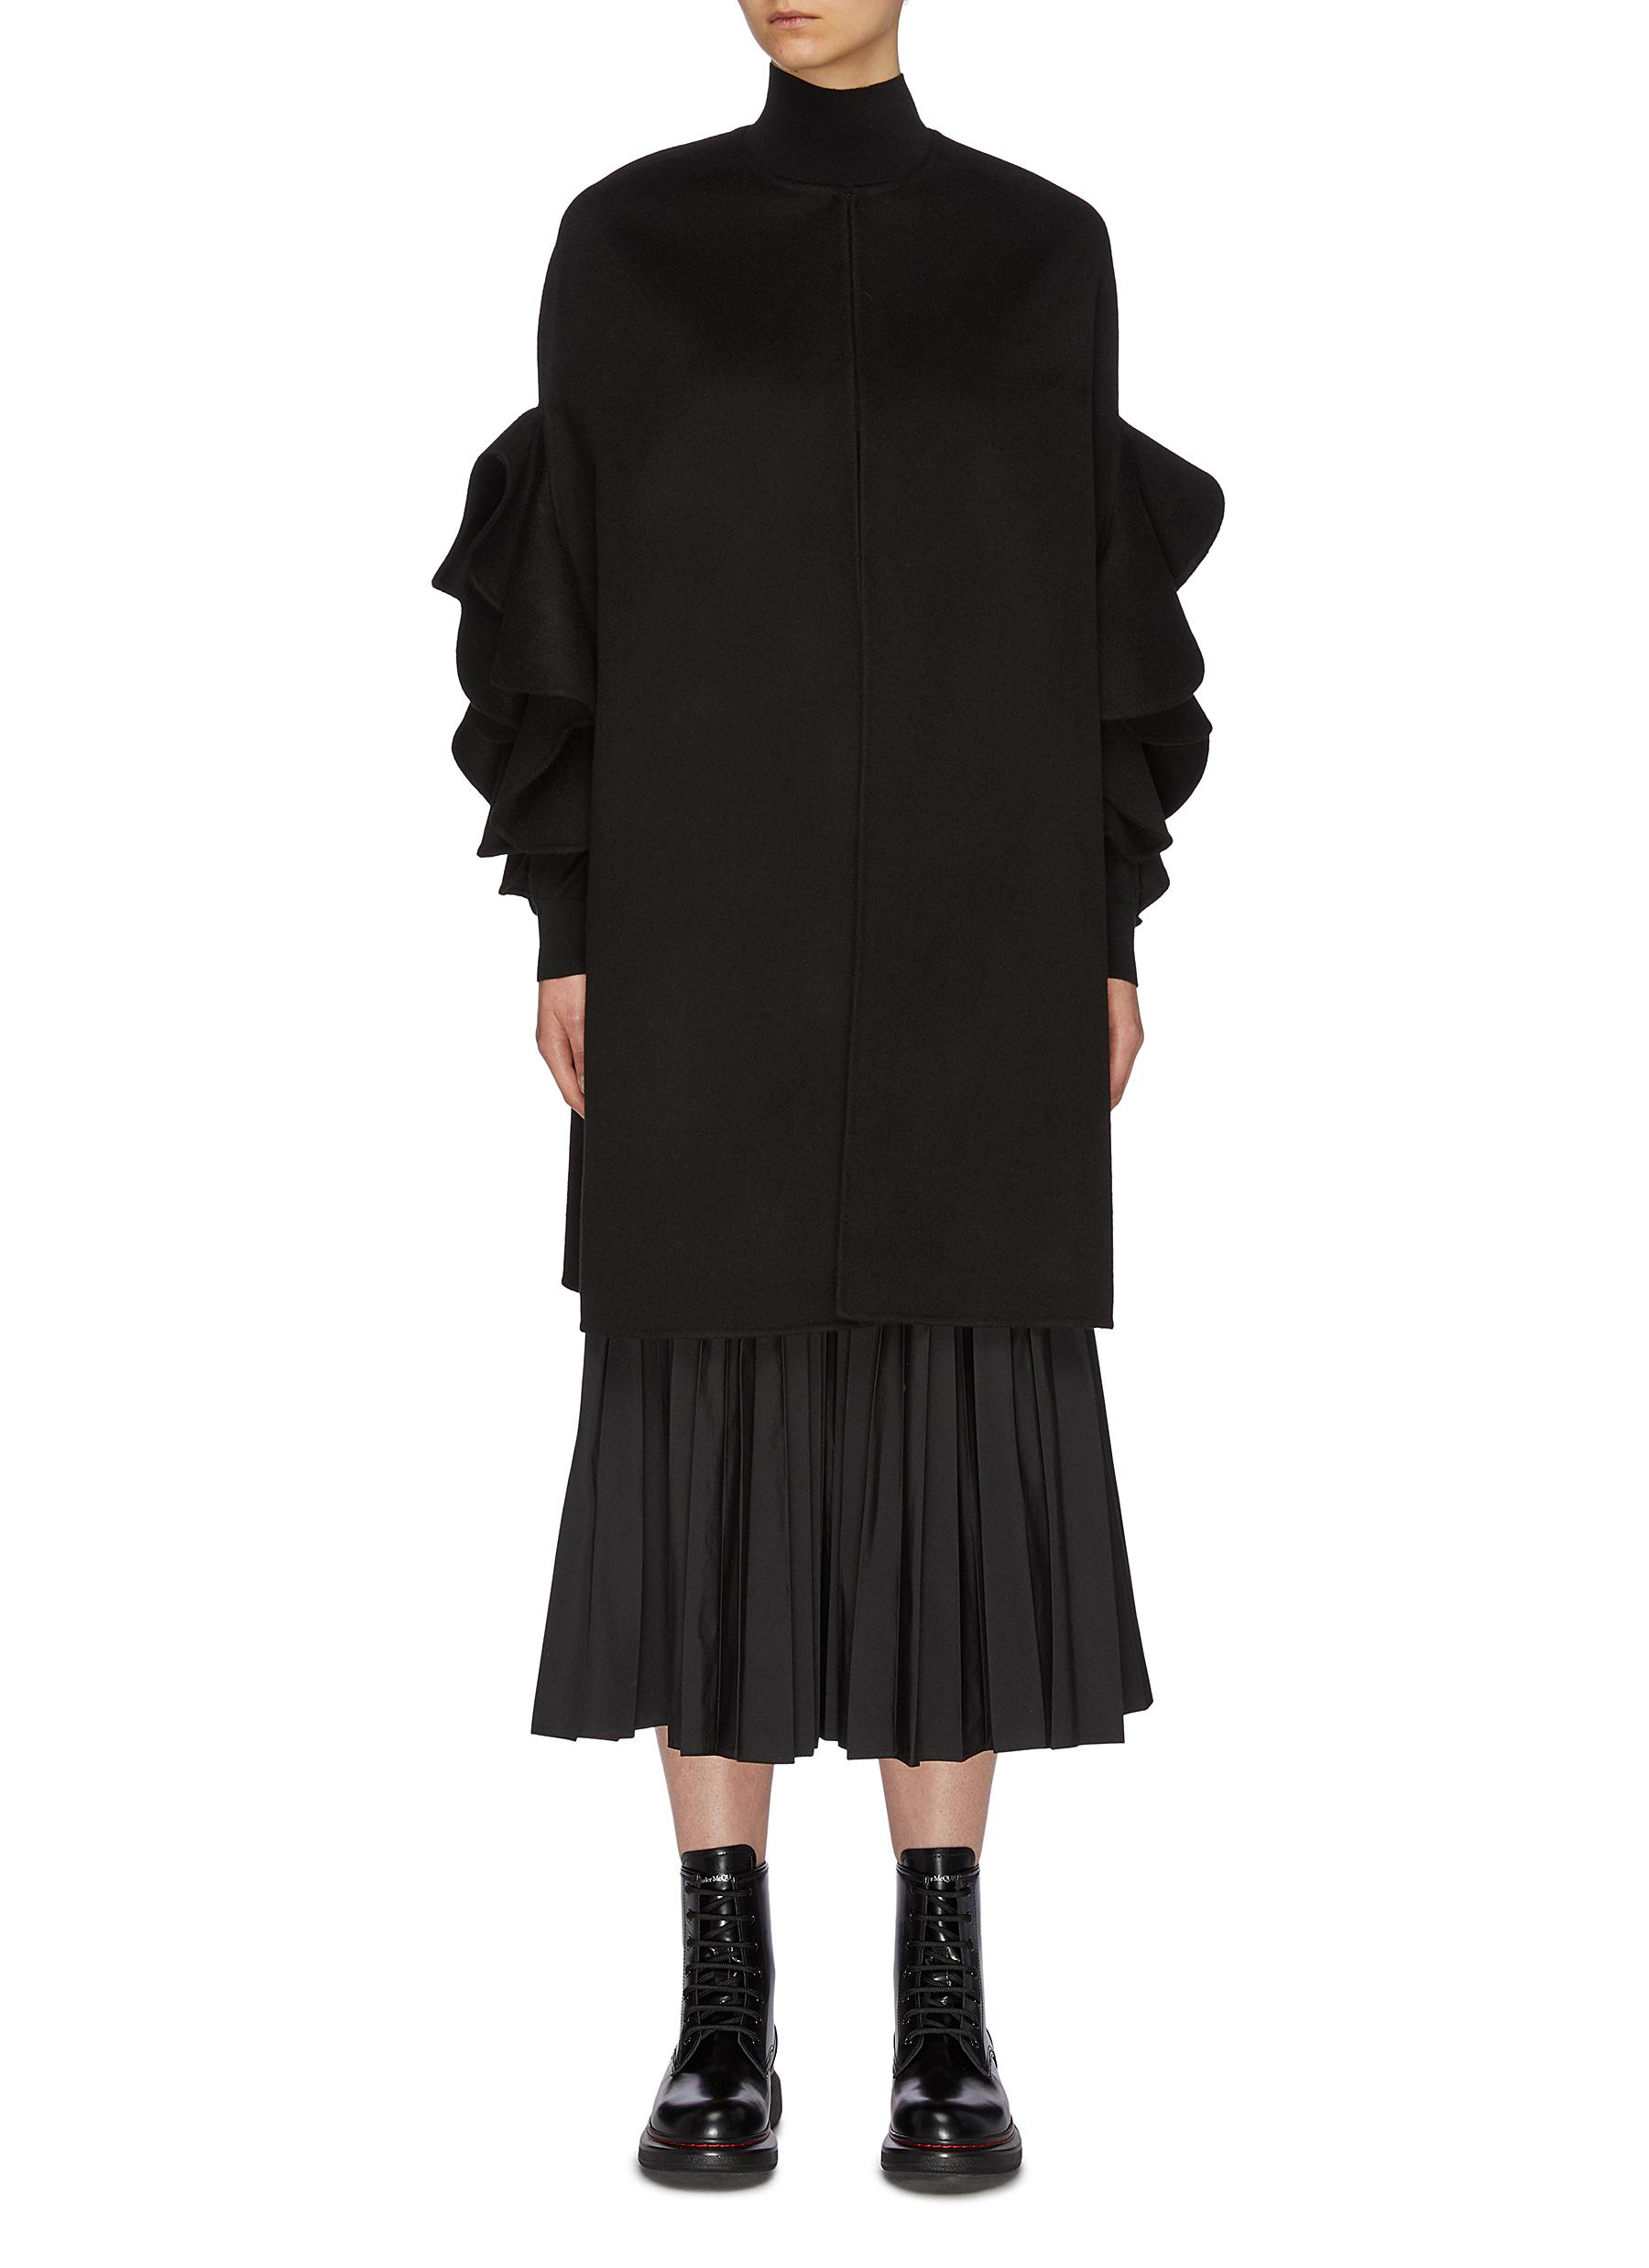 Ruffle sleeve virgin wool-cashmere melton cape coat by Valentino